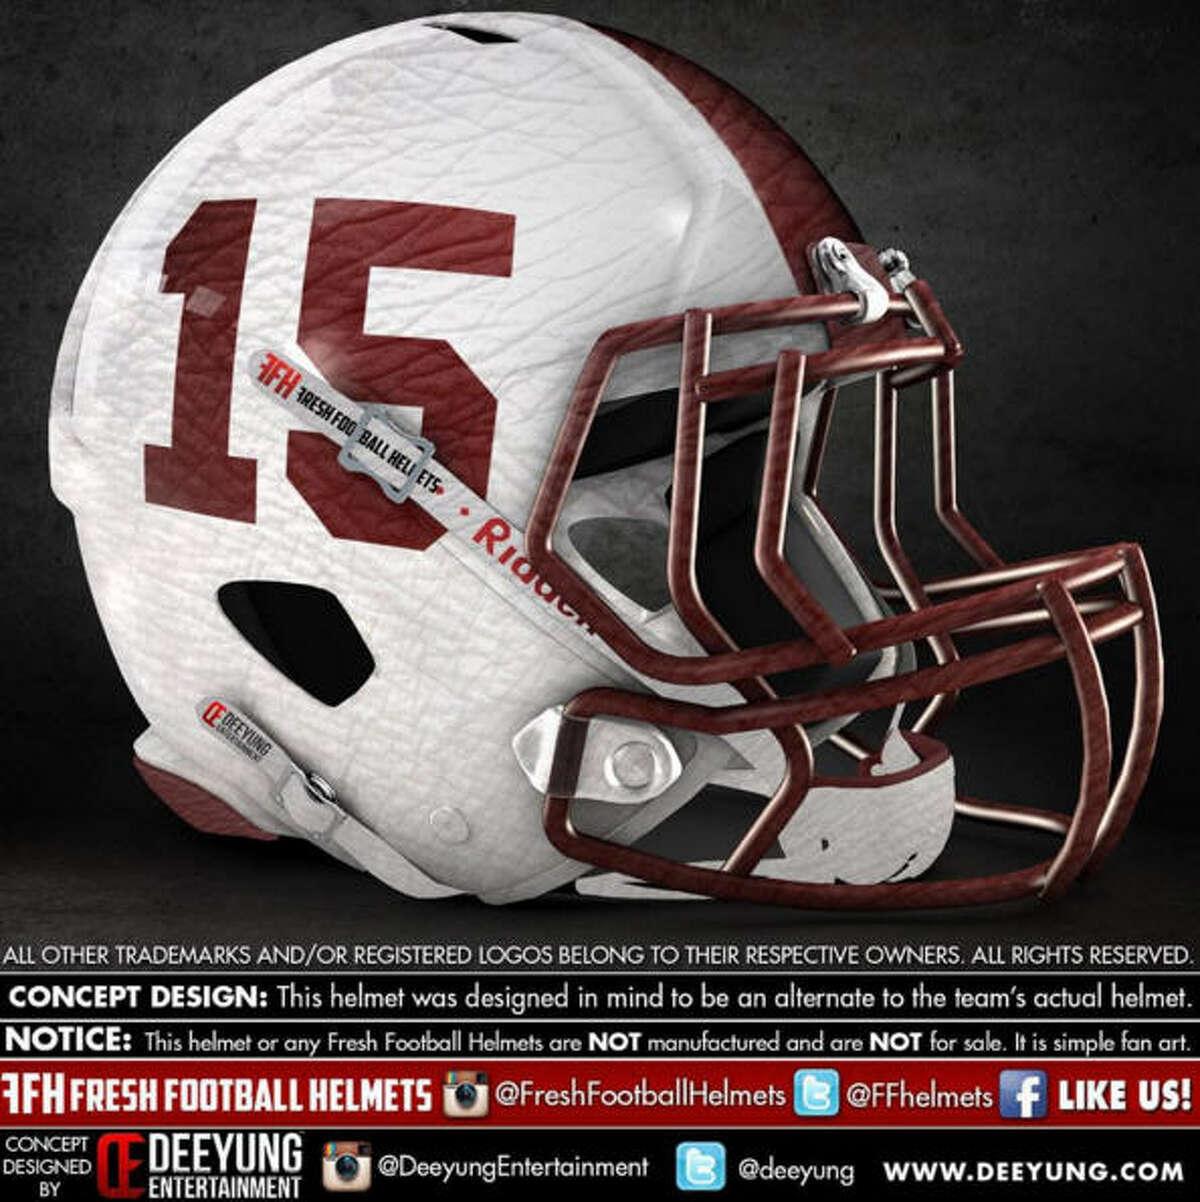 Alabama Crimson Tide concept football helmet by Dylan Young of Deeyung Entertainment.